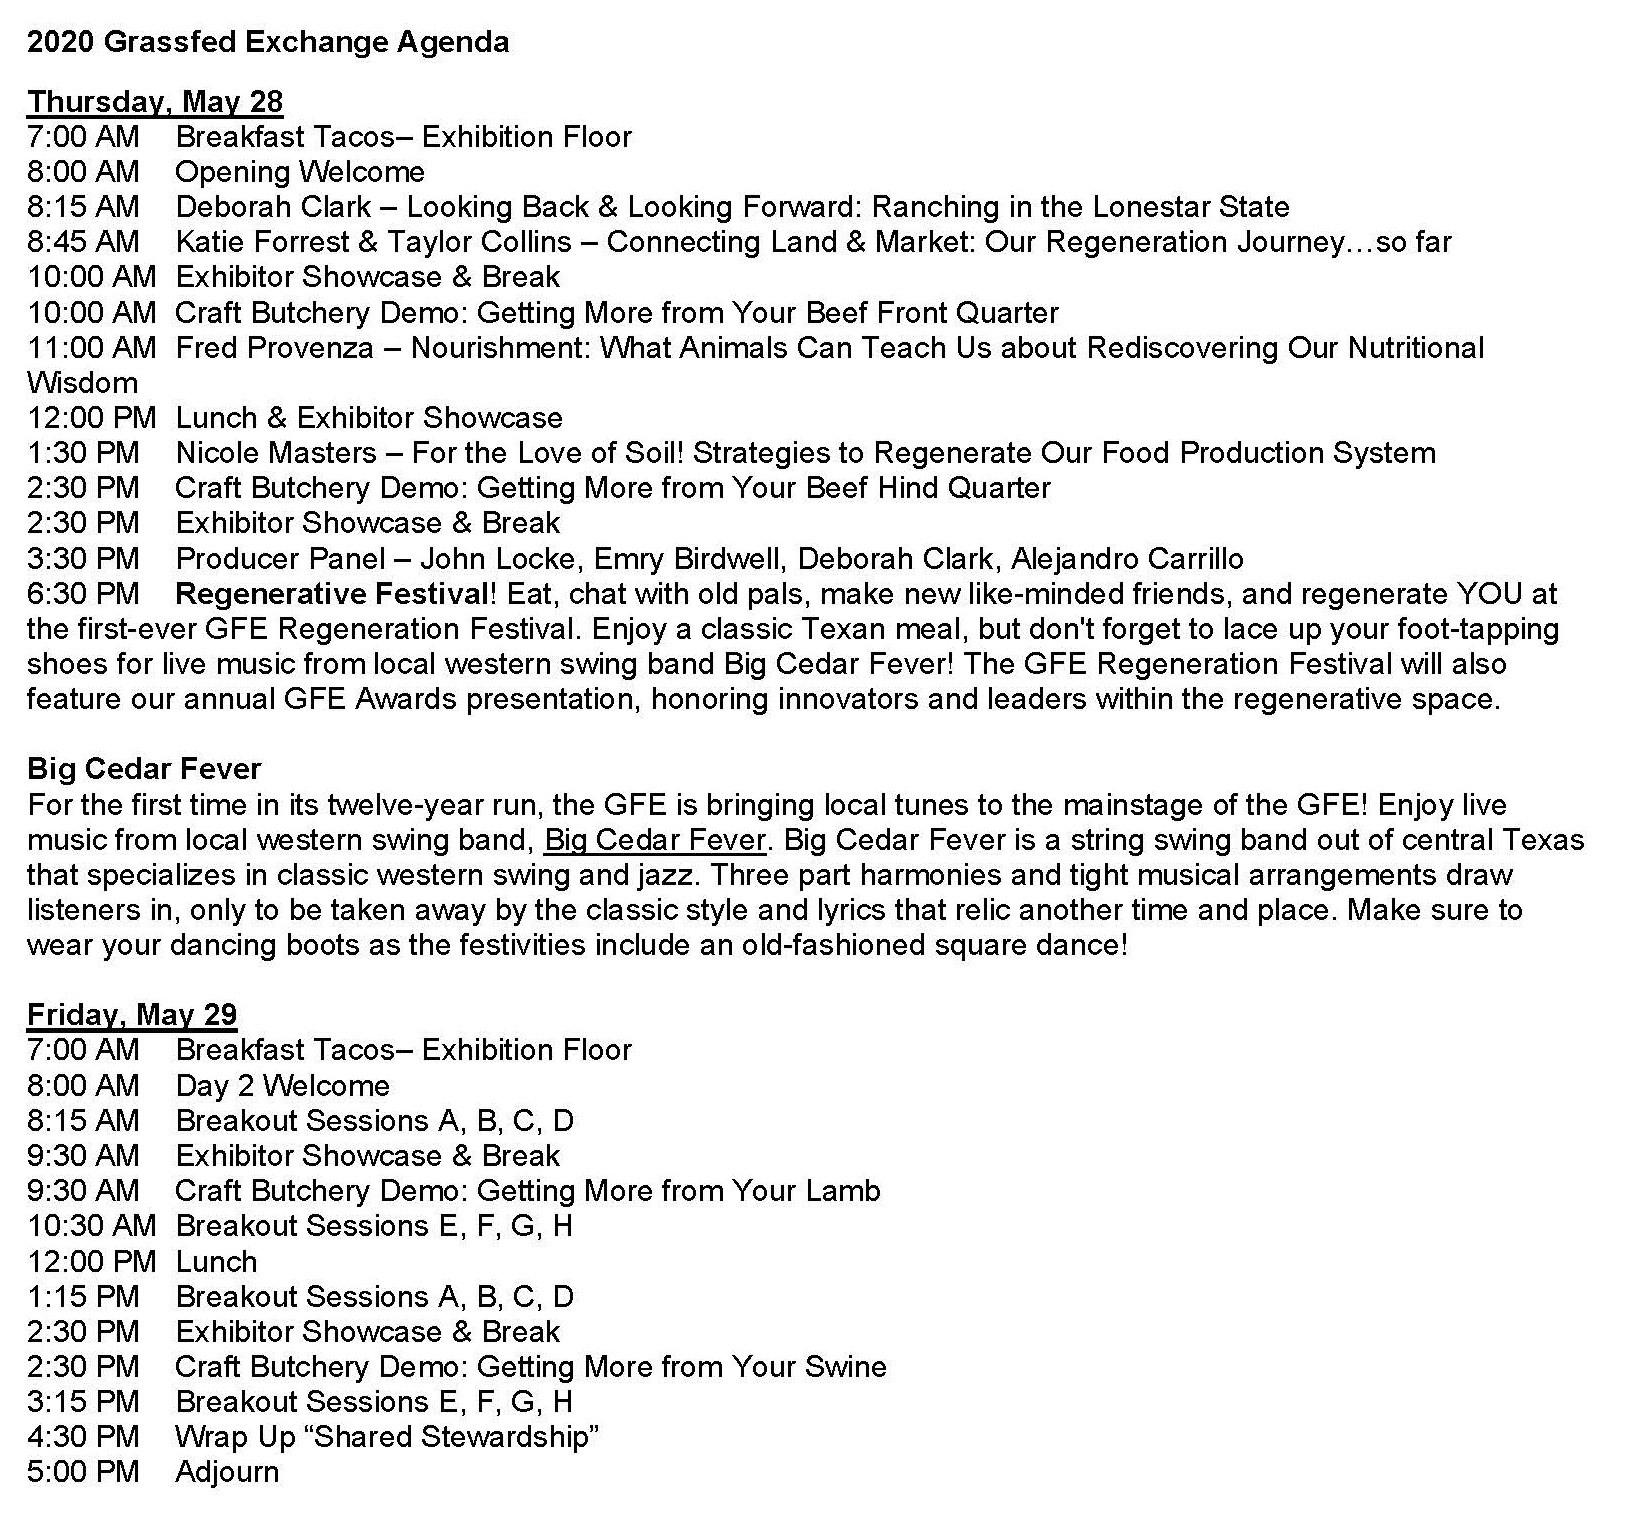 2020-Grassfed-Exchange-Agenda_Page_2.jpg